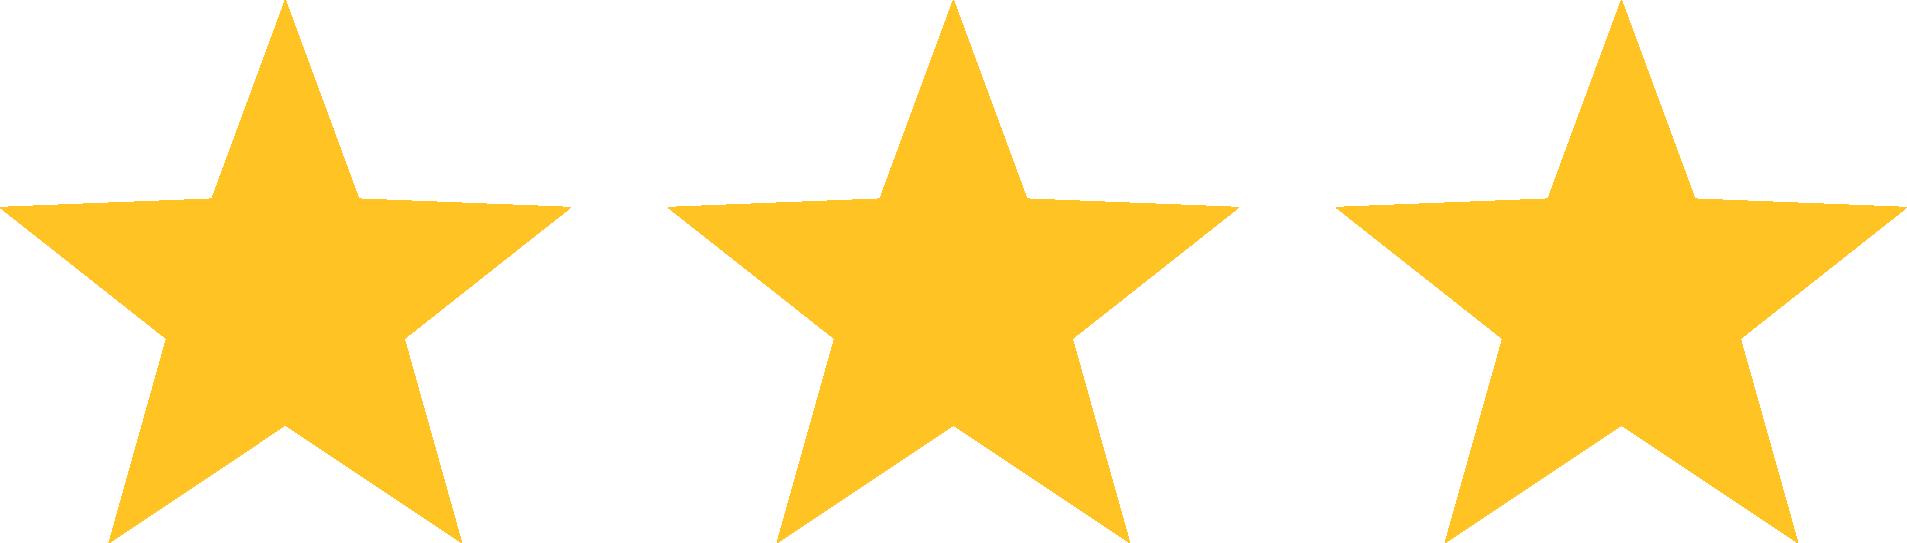 3 Star Vector at GetDrawings.com.